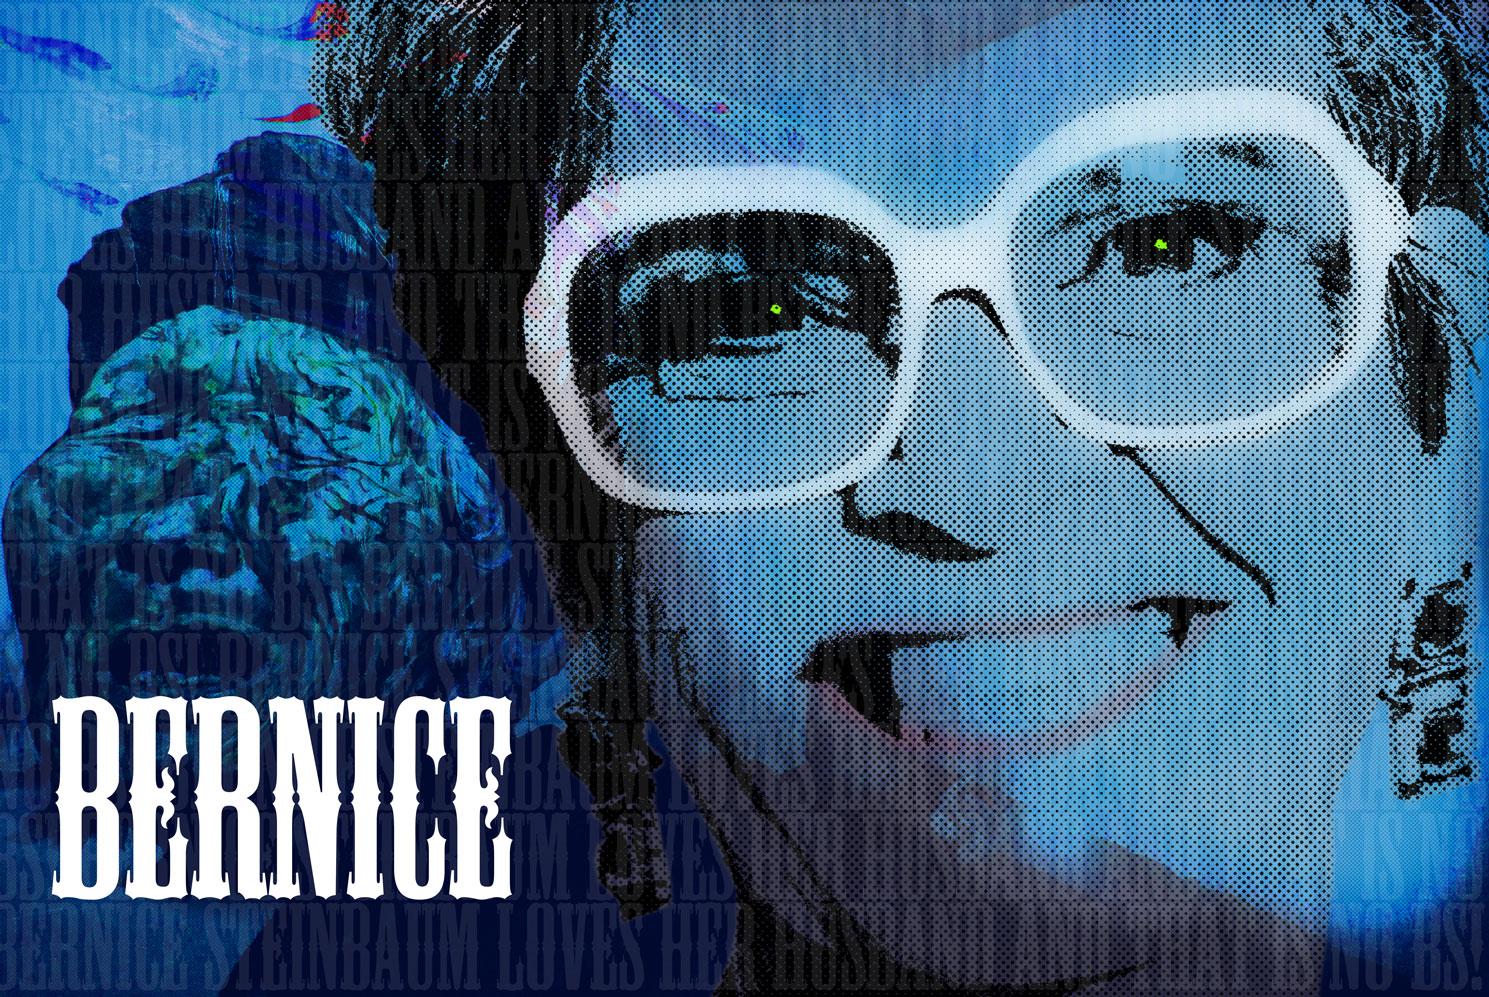 Bernice Blue Poster